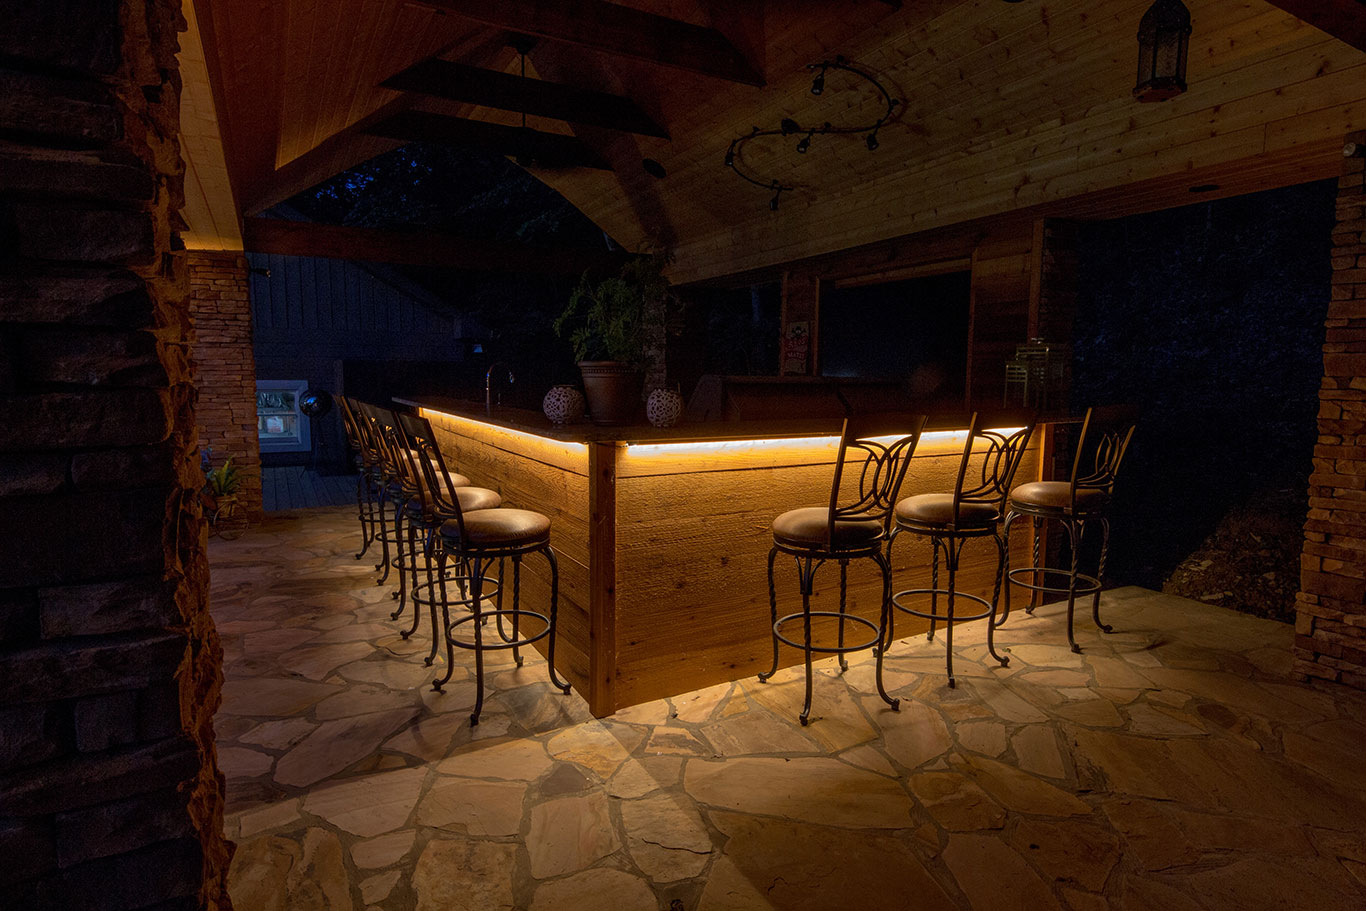 Strip lighting under outdoor bar